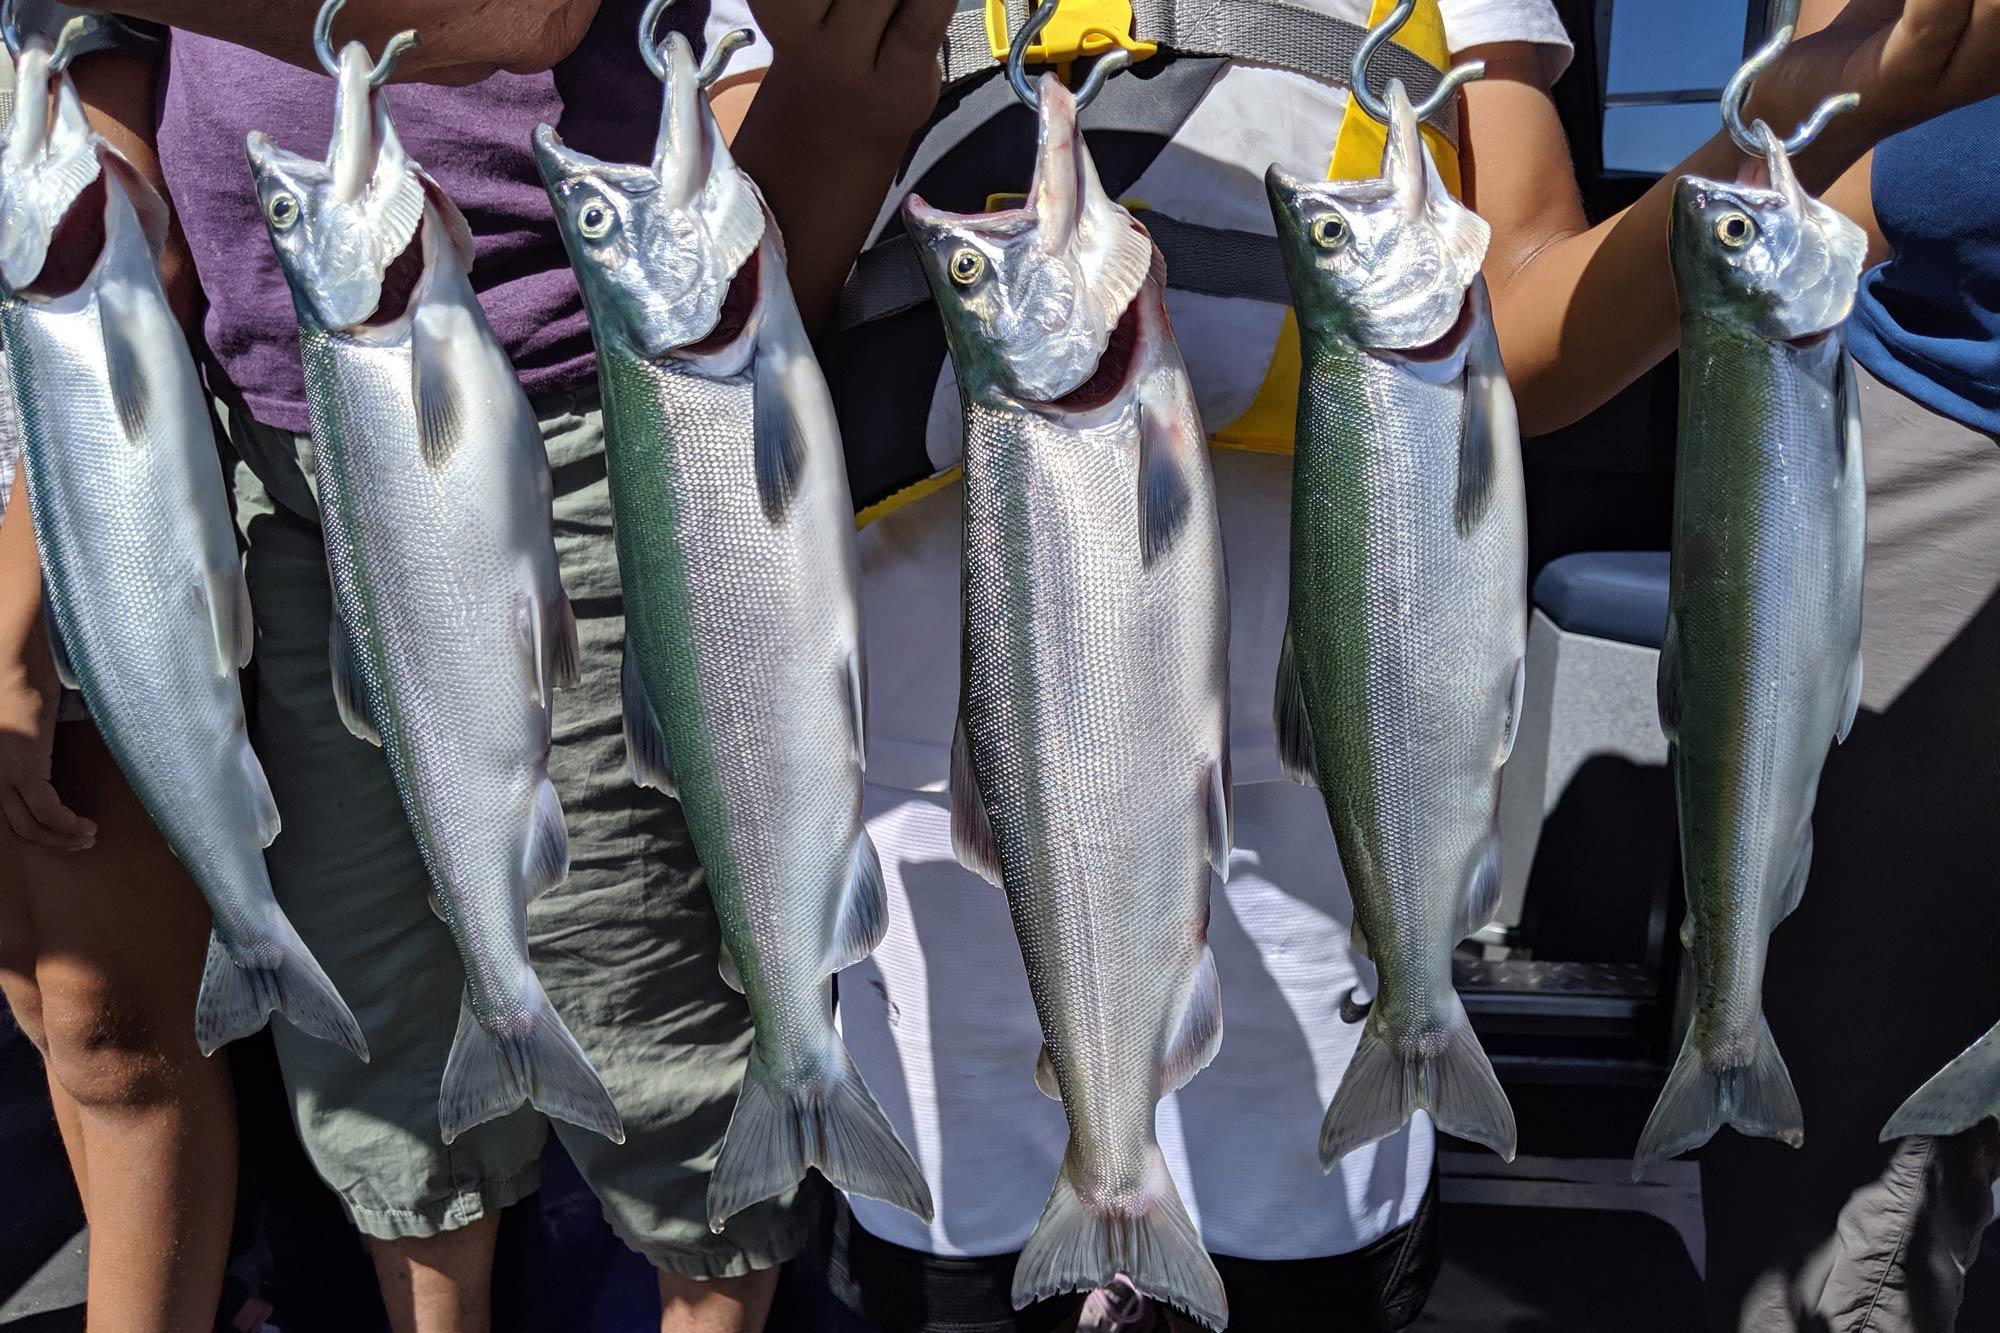 Five caught Kokanee hanging of a board